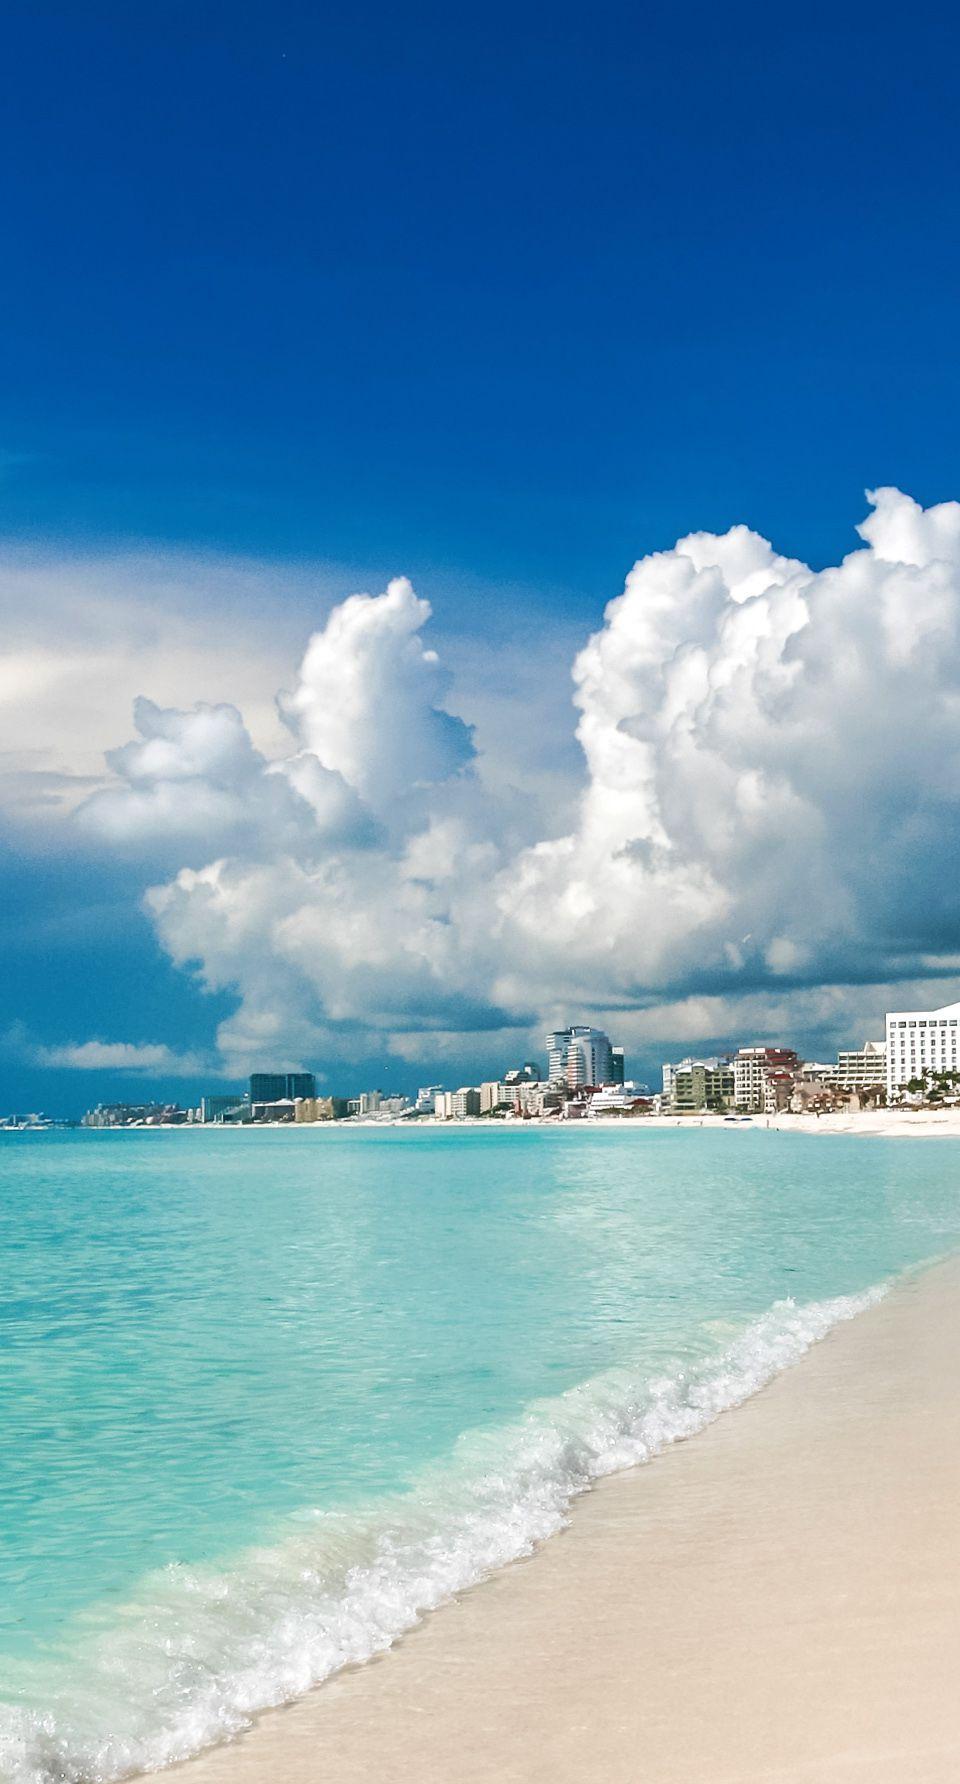 Idyllic beach at Cancun, Mexico